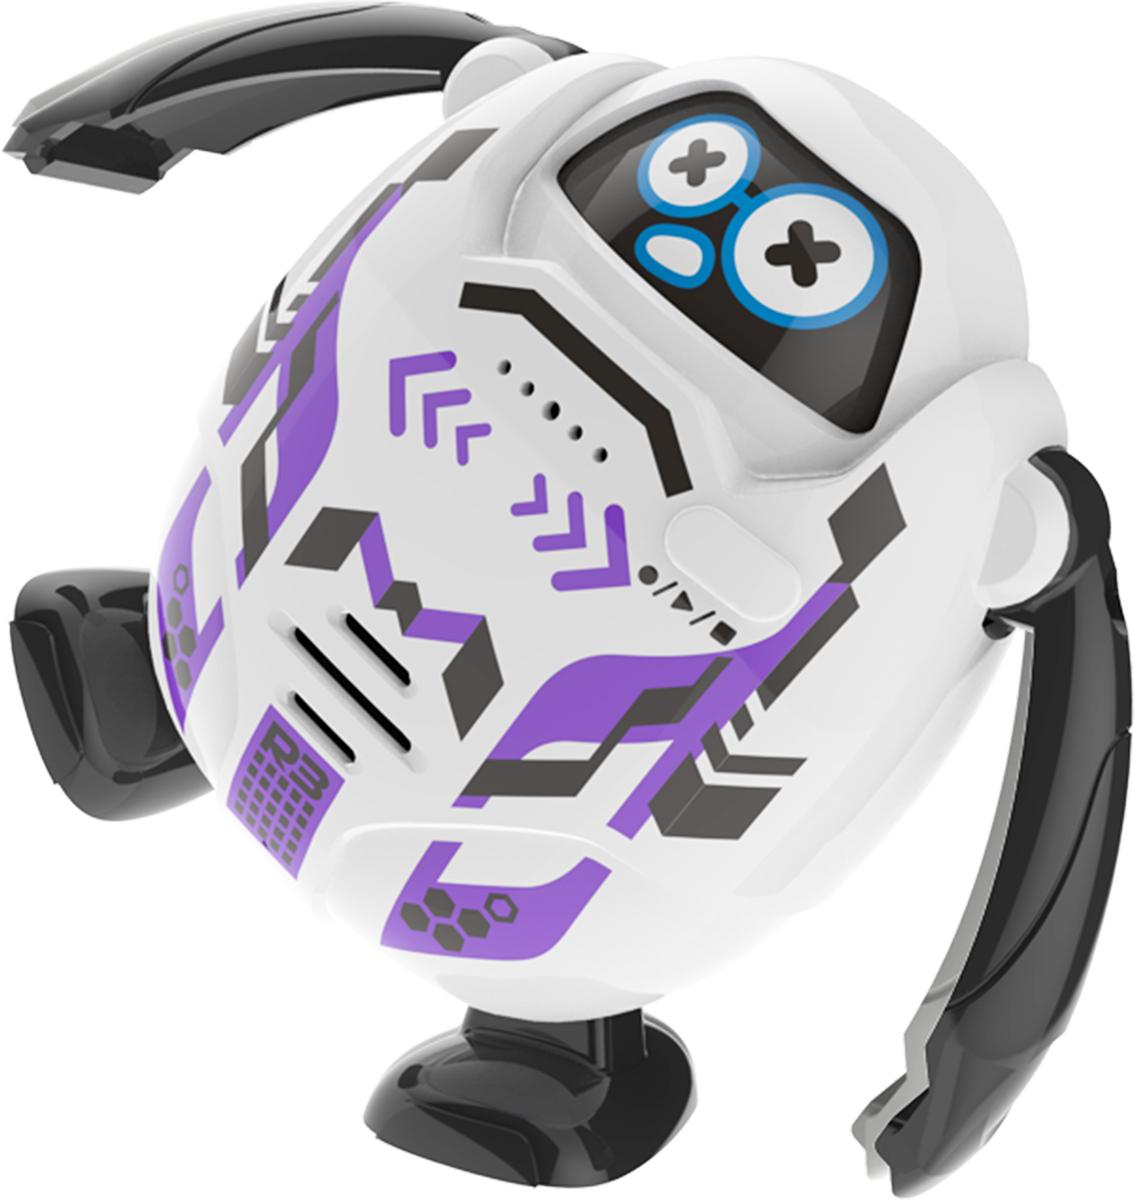 Silverlit Old School Робот Токибо цвет белый